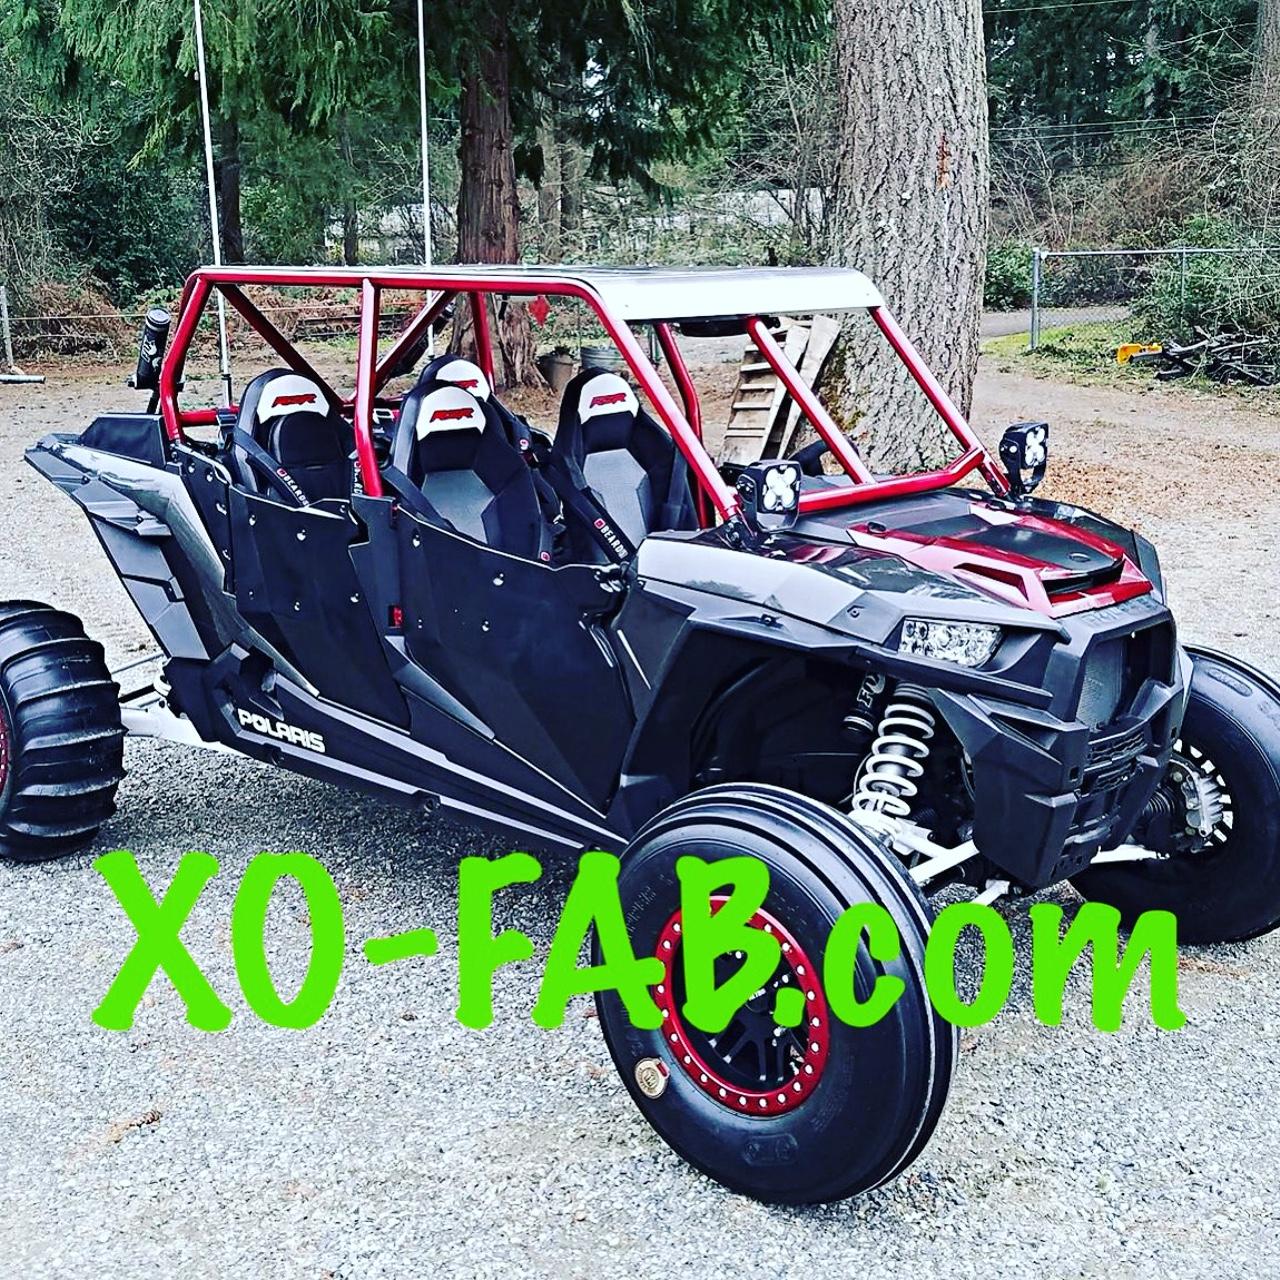 Rzr Xp4 1000 Flat Top Cage Kit